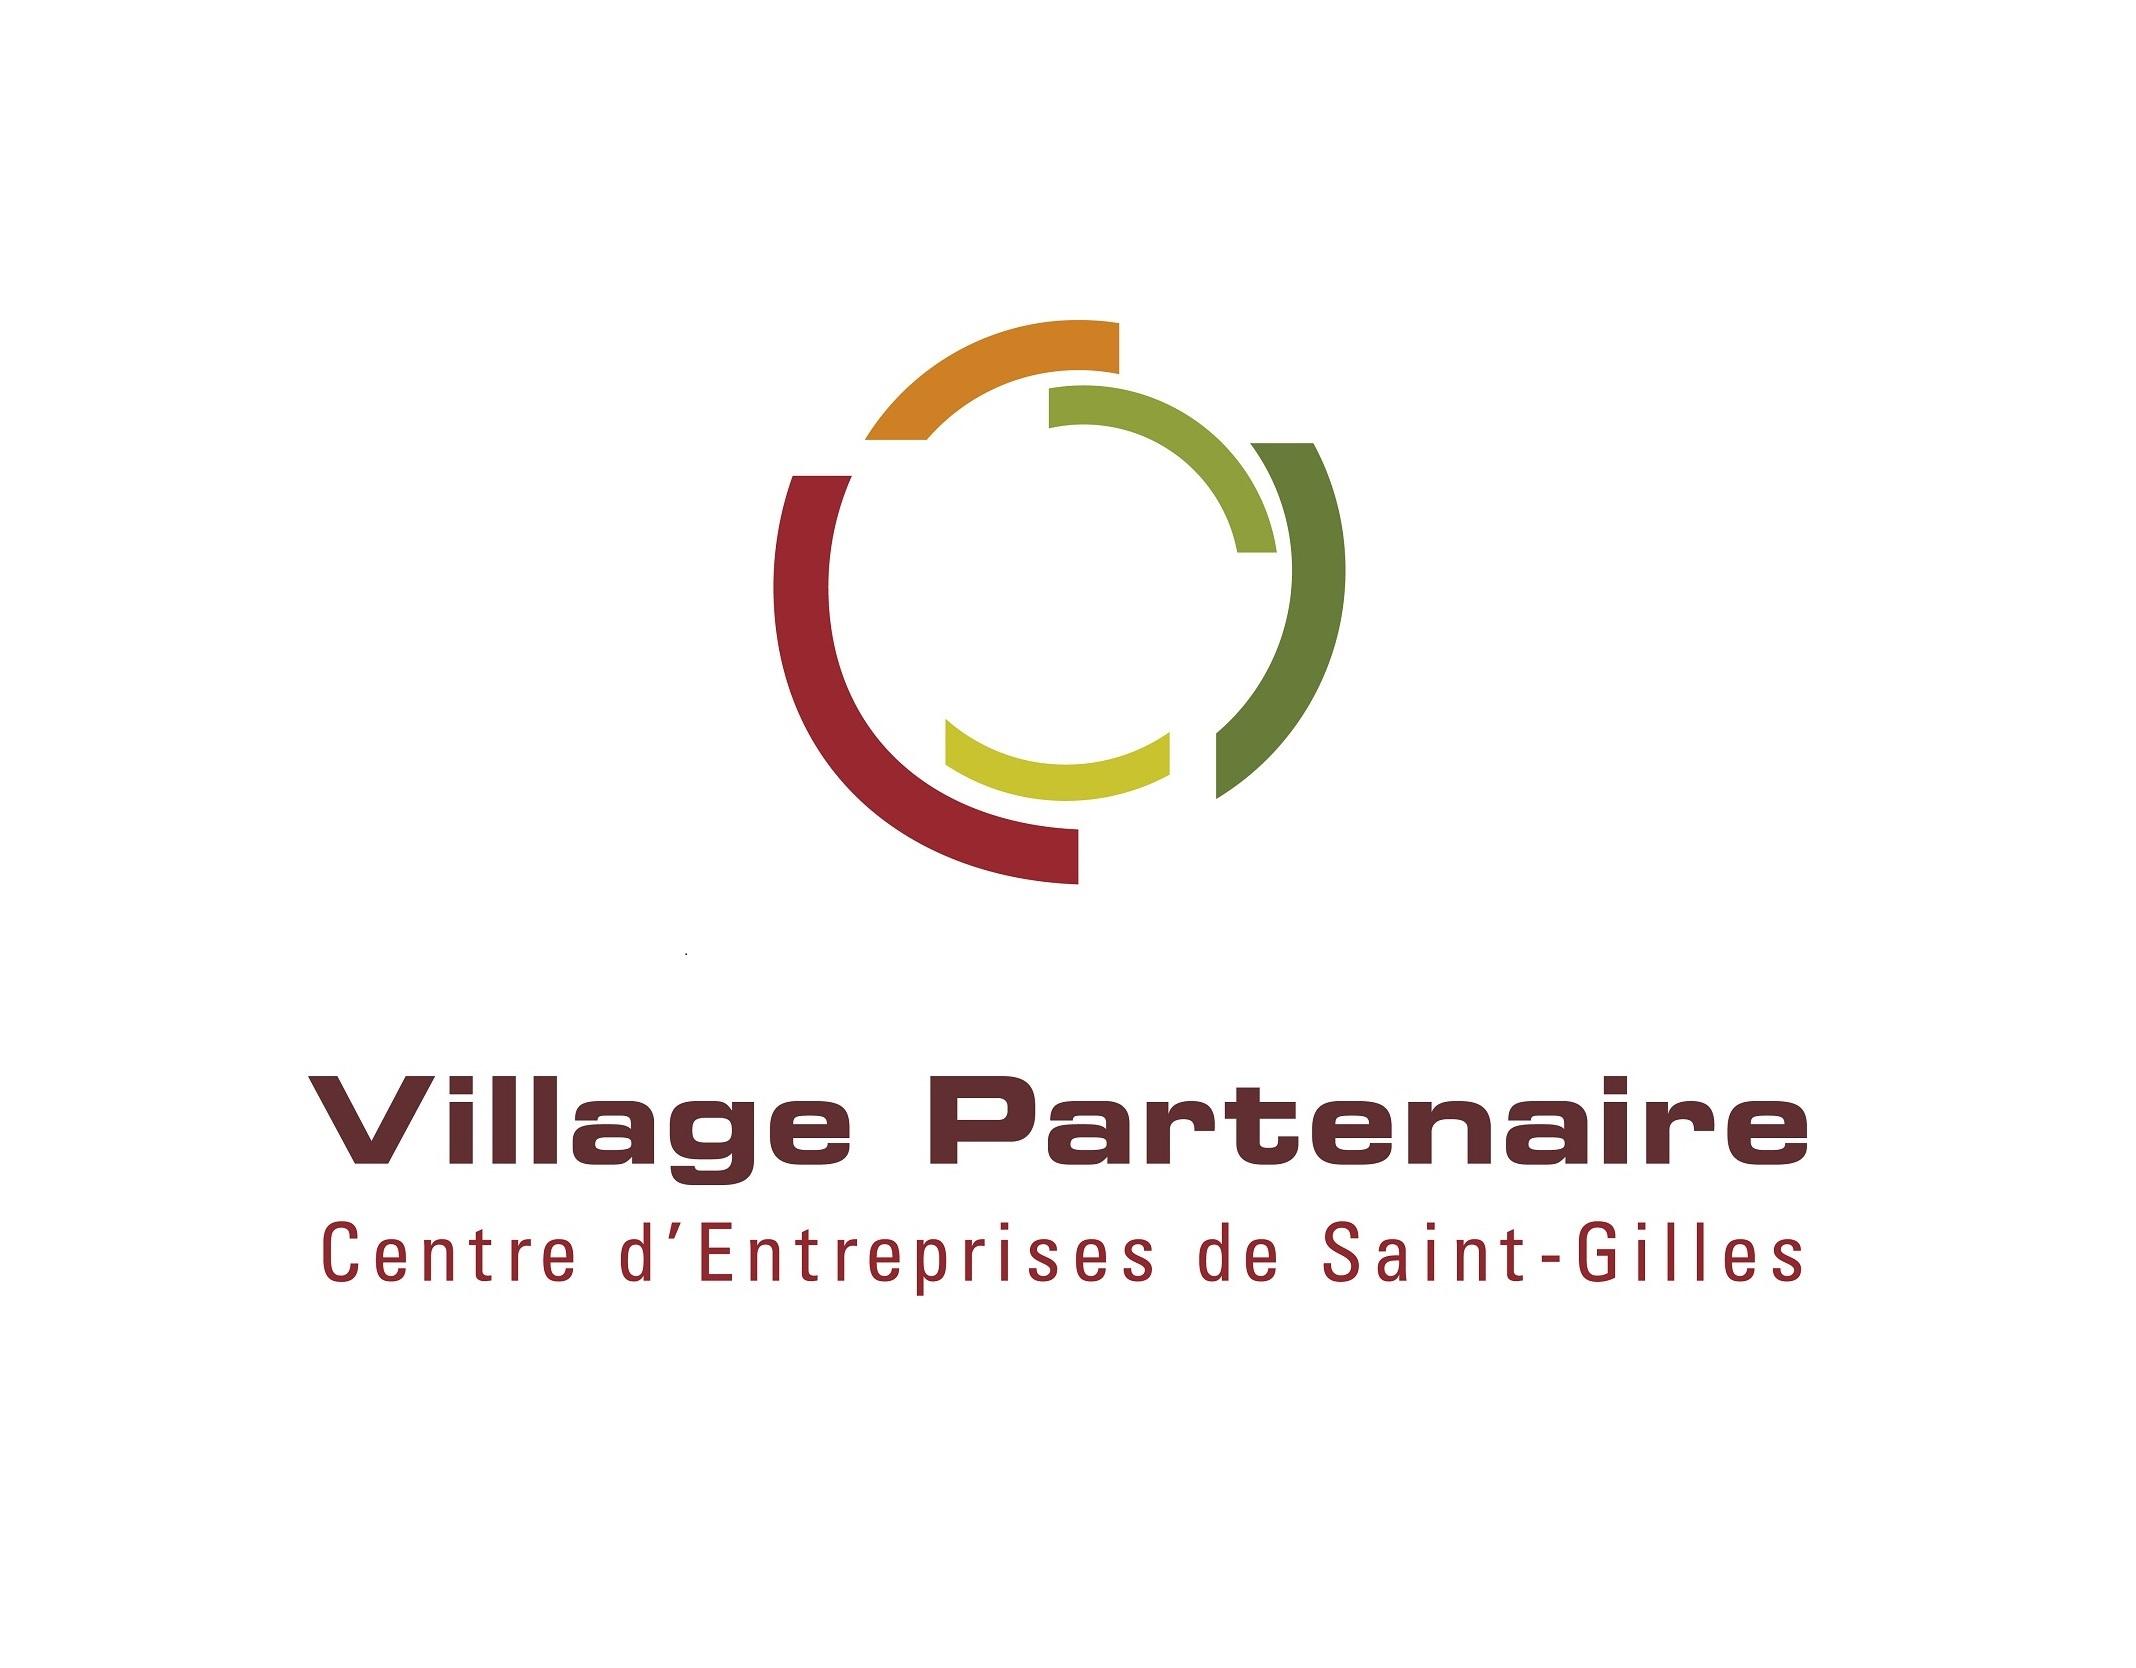 Village Partenaire